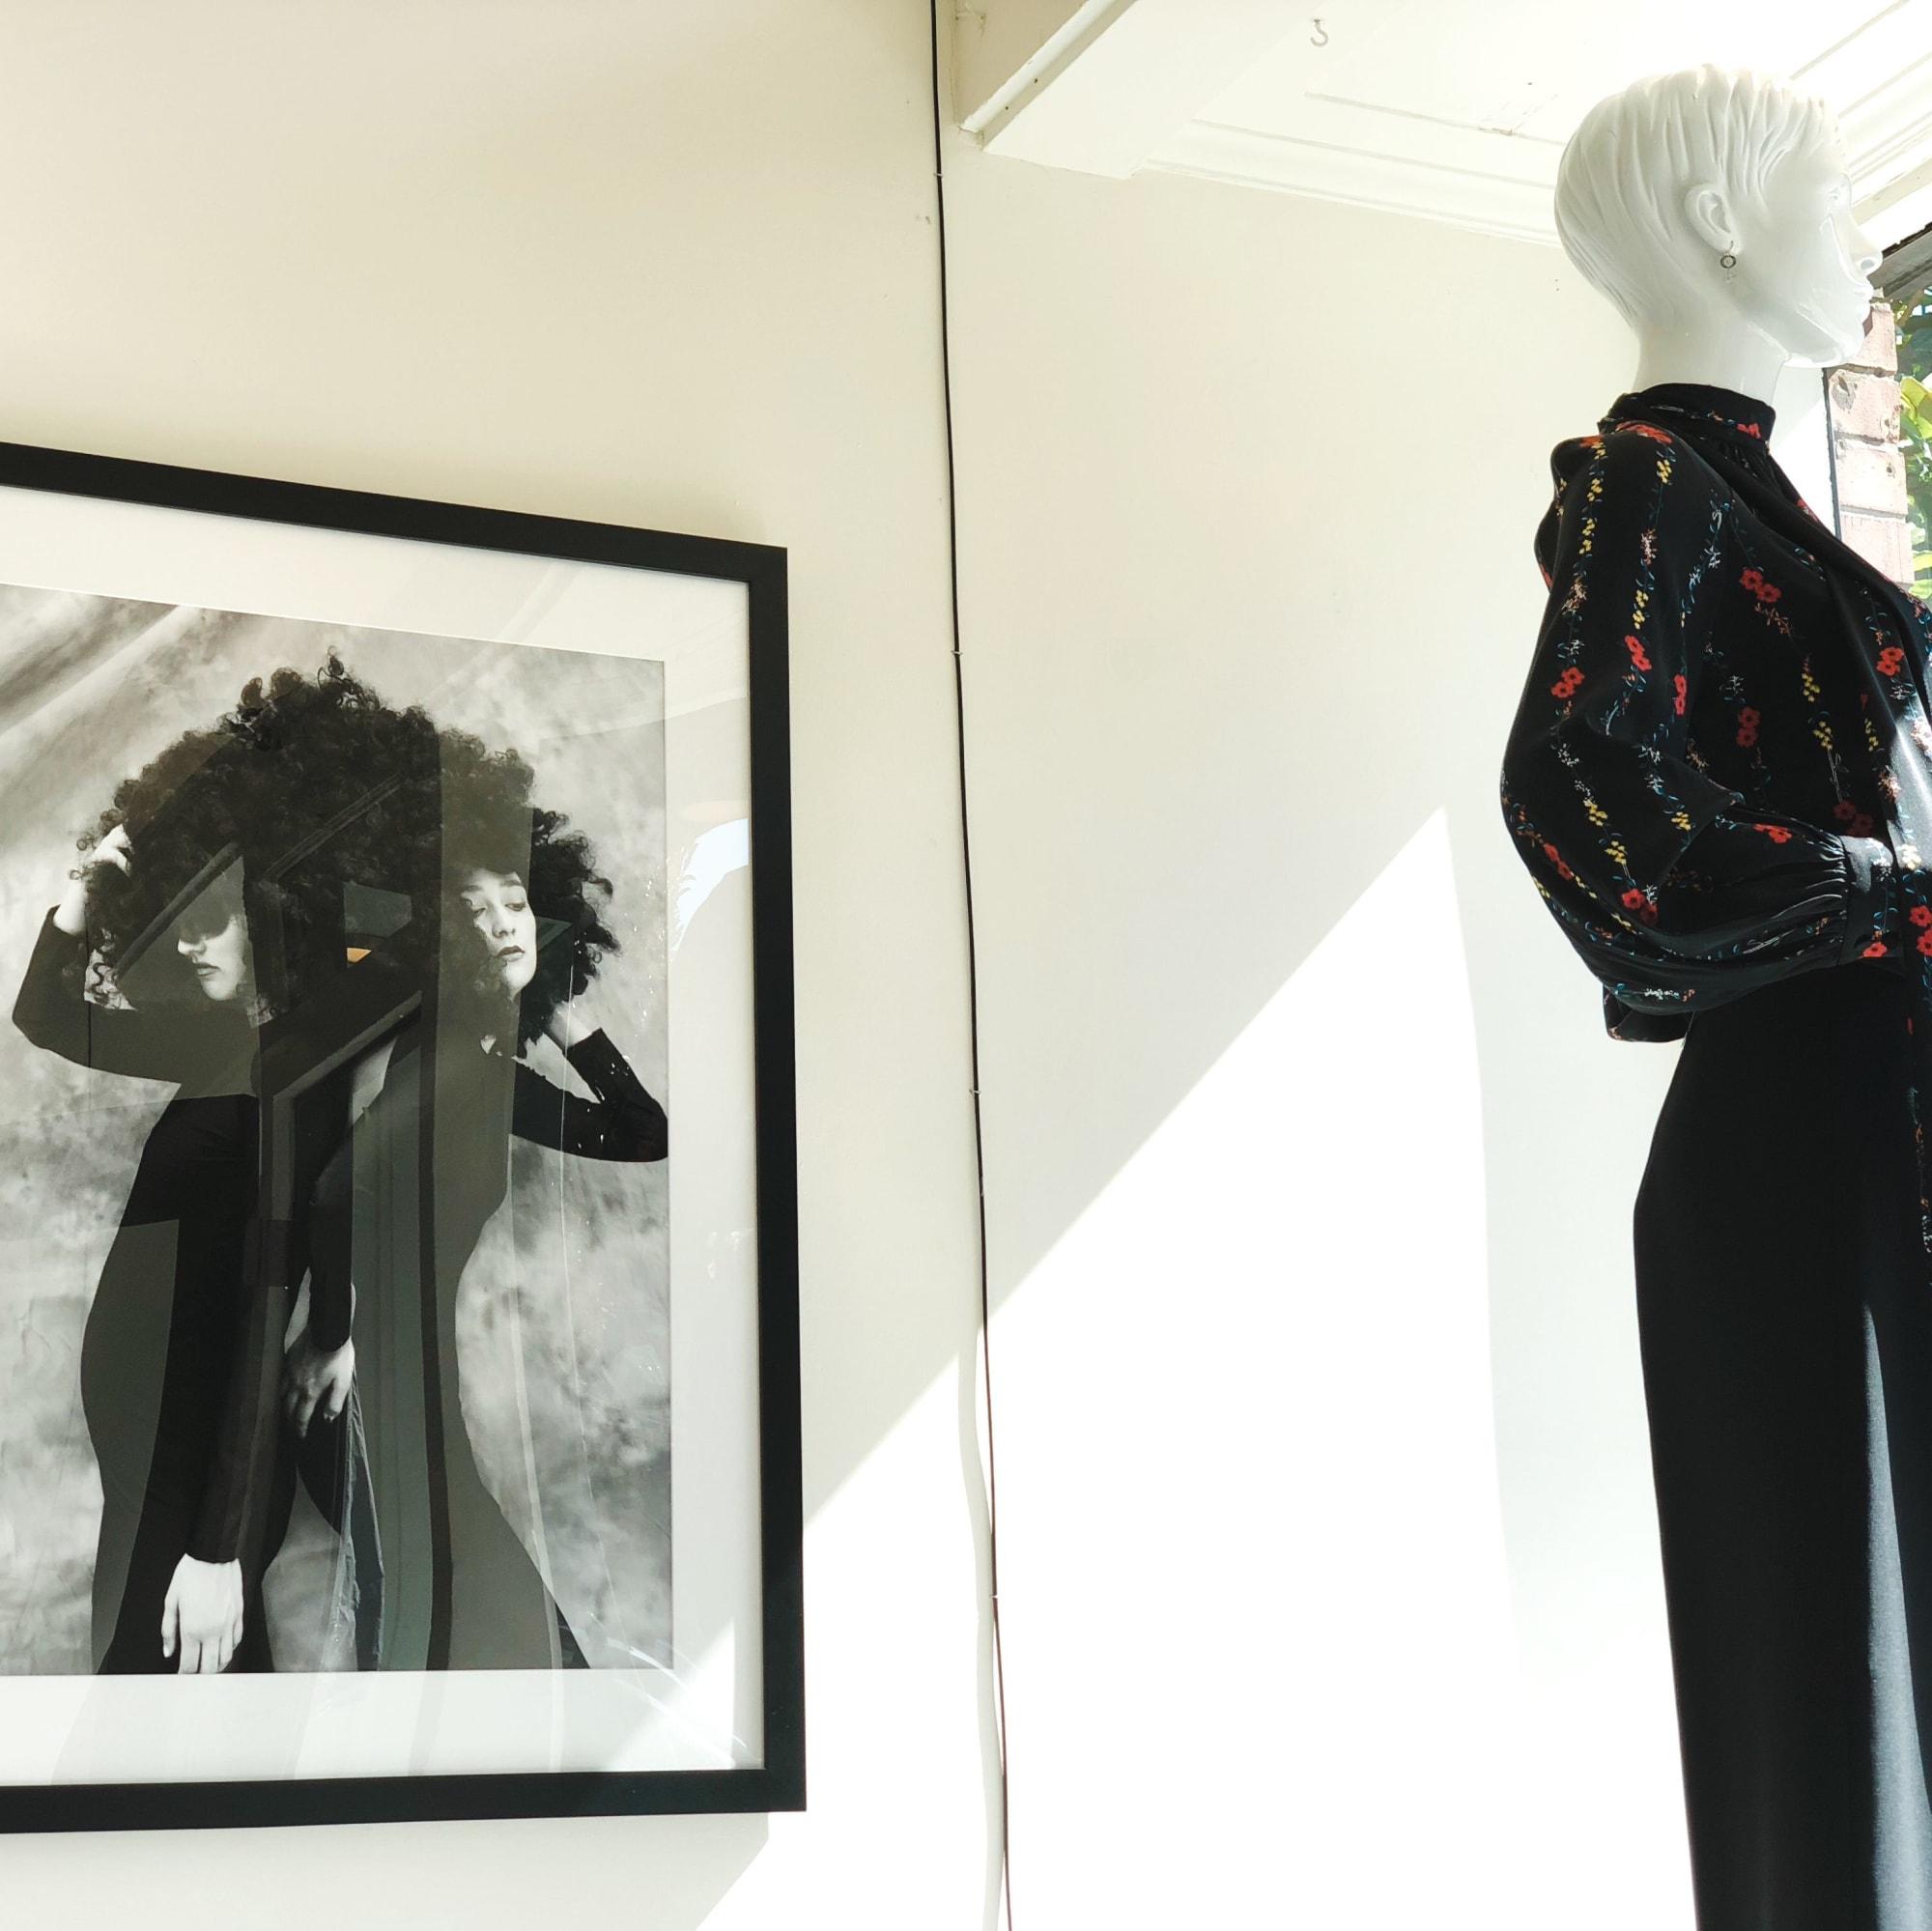 Art Curation by Upstart Modern seen at Danielle San Francisco, San Francisco - Marjorie Salvaterra Show